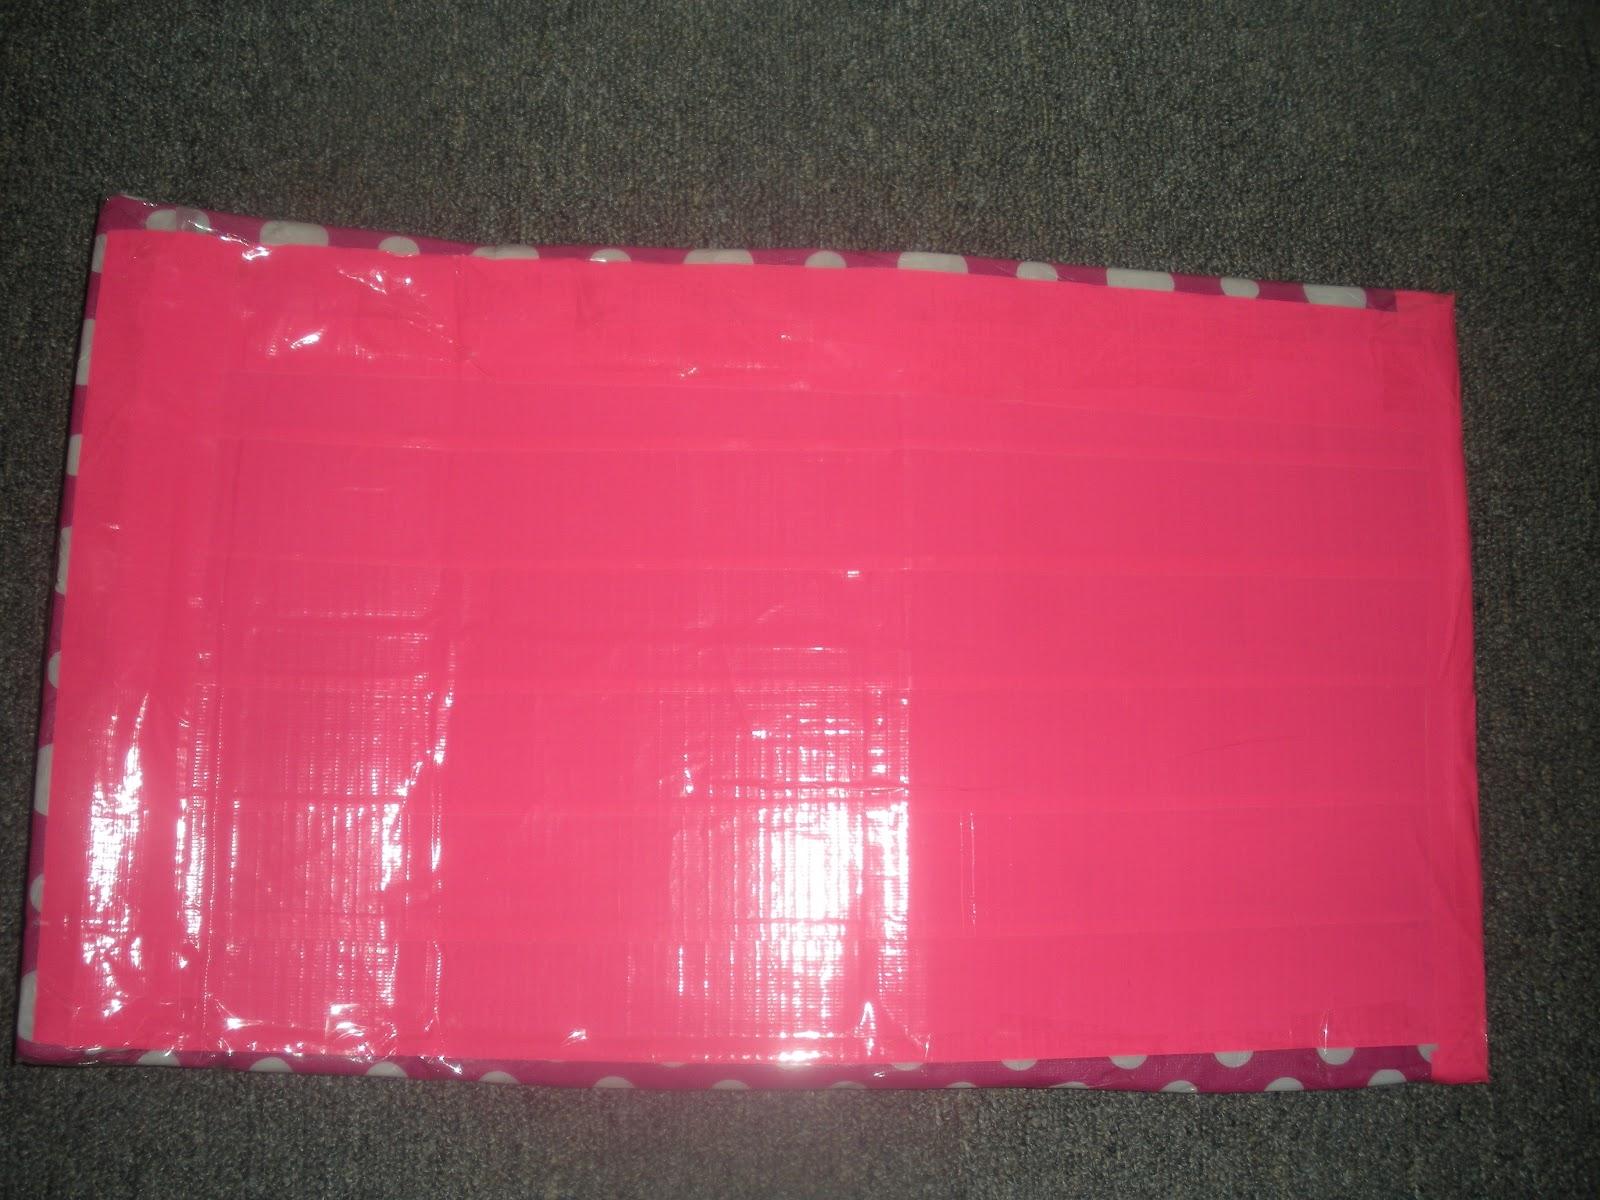 yoga mats gymnastic itm tumbling panel large mat gym exercise diy folding s gymnastics product pad description